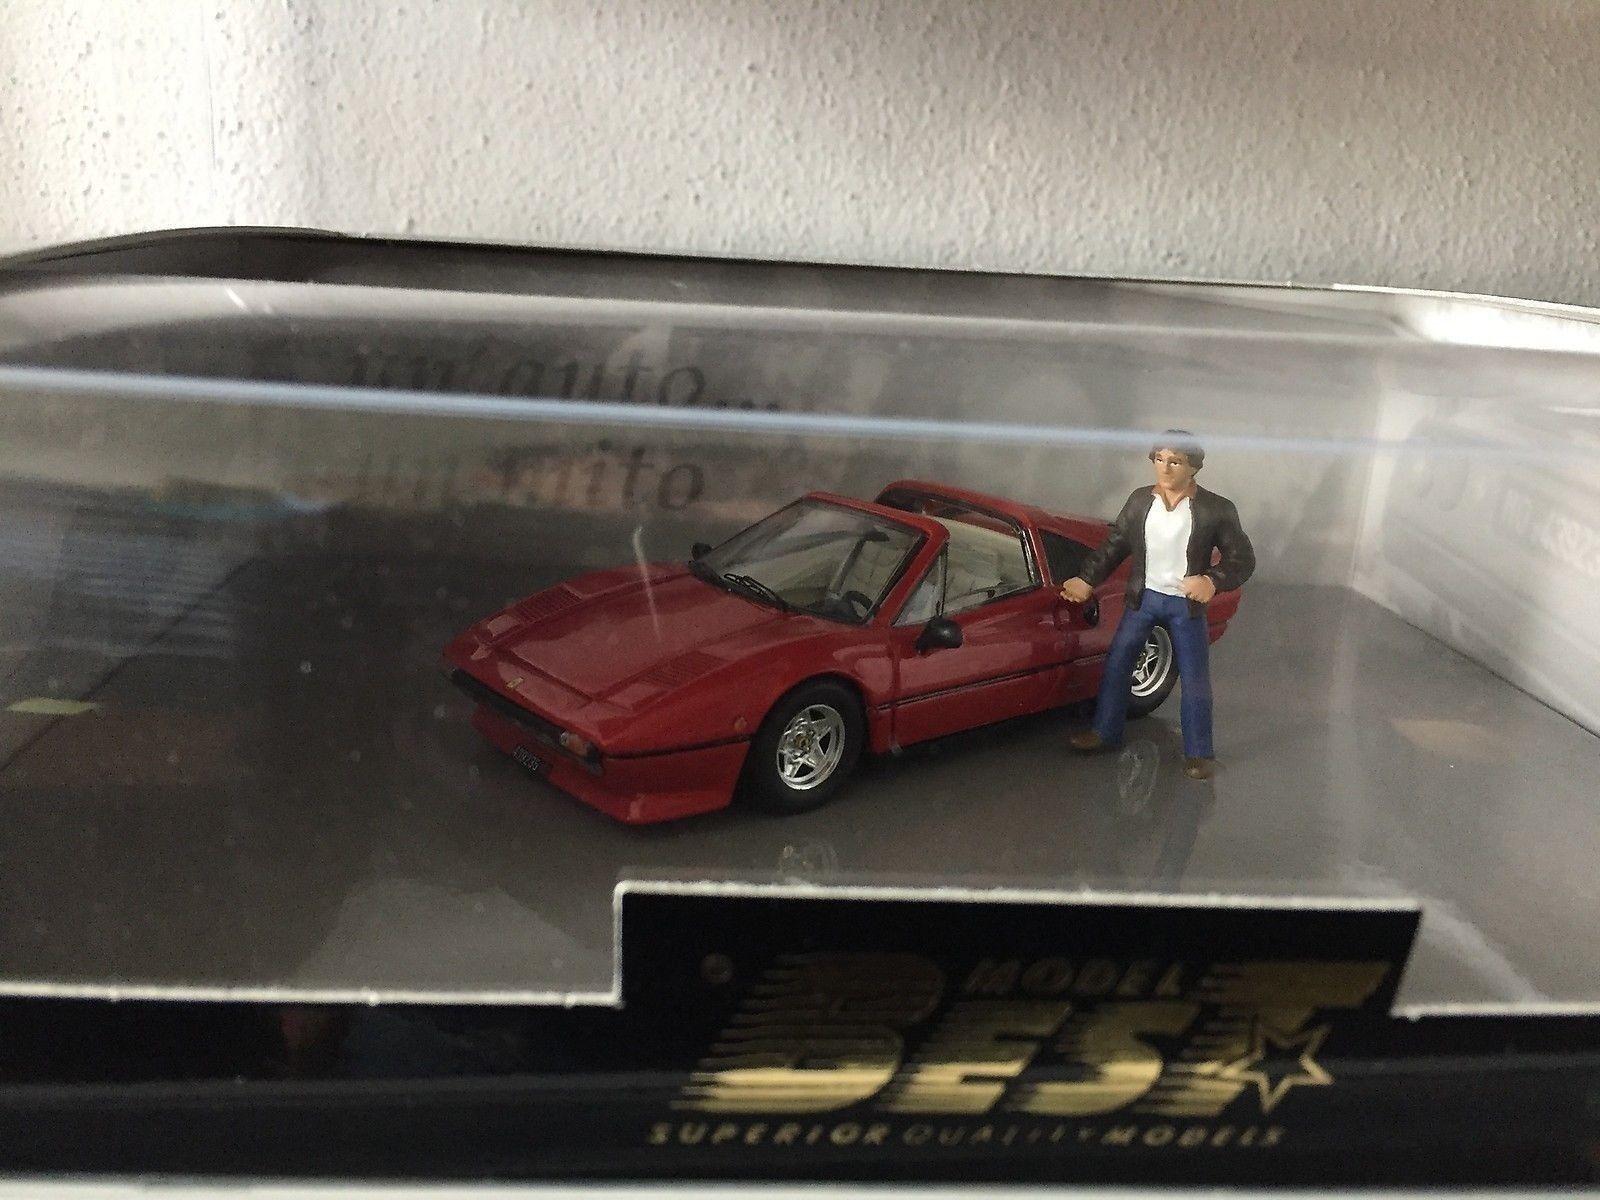 hasta 60% de descuento  183 183 183 Ferrari 308 GTS Villeneuve's Coche 1982 - BEST MODEL 1 43  ventas en linea